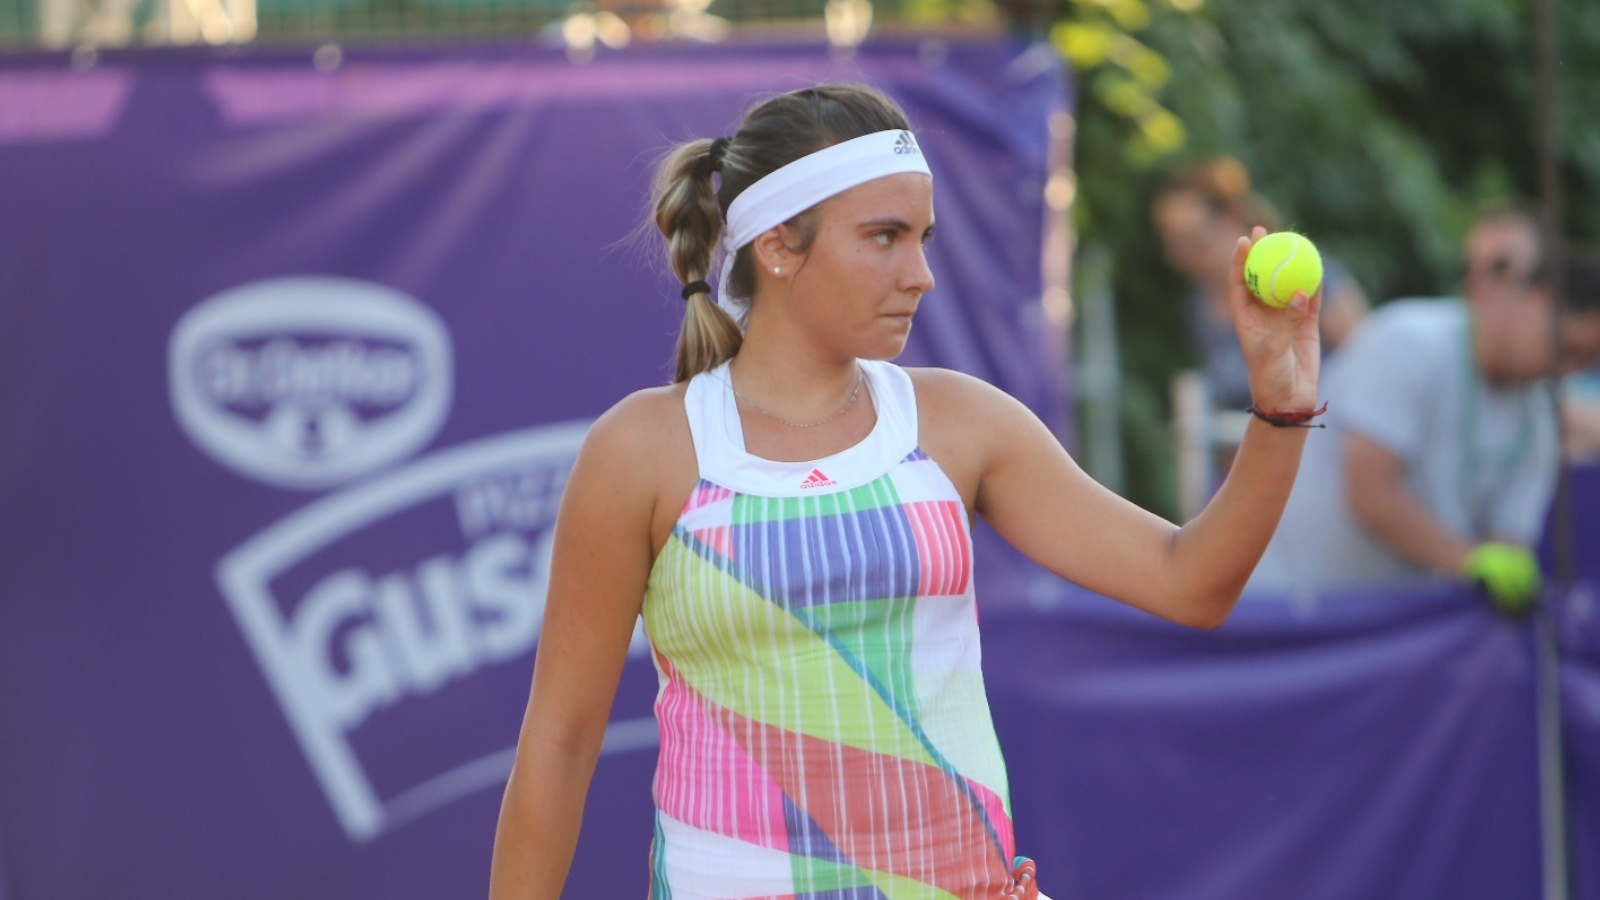 Ponturi Tenis Ruse – Suarez Navarro – Bucuresti